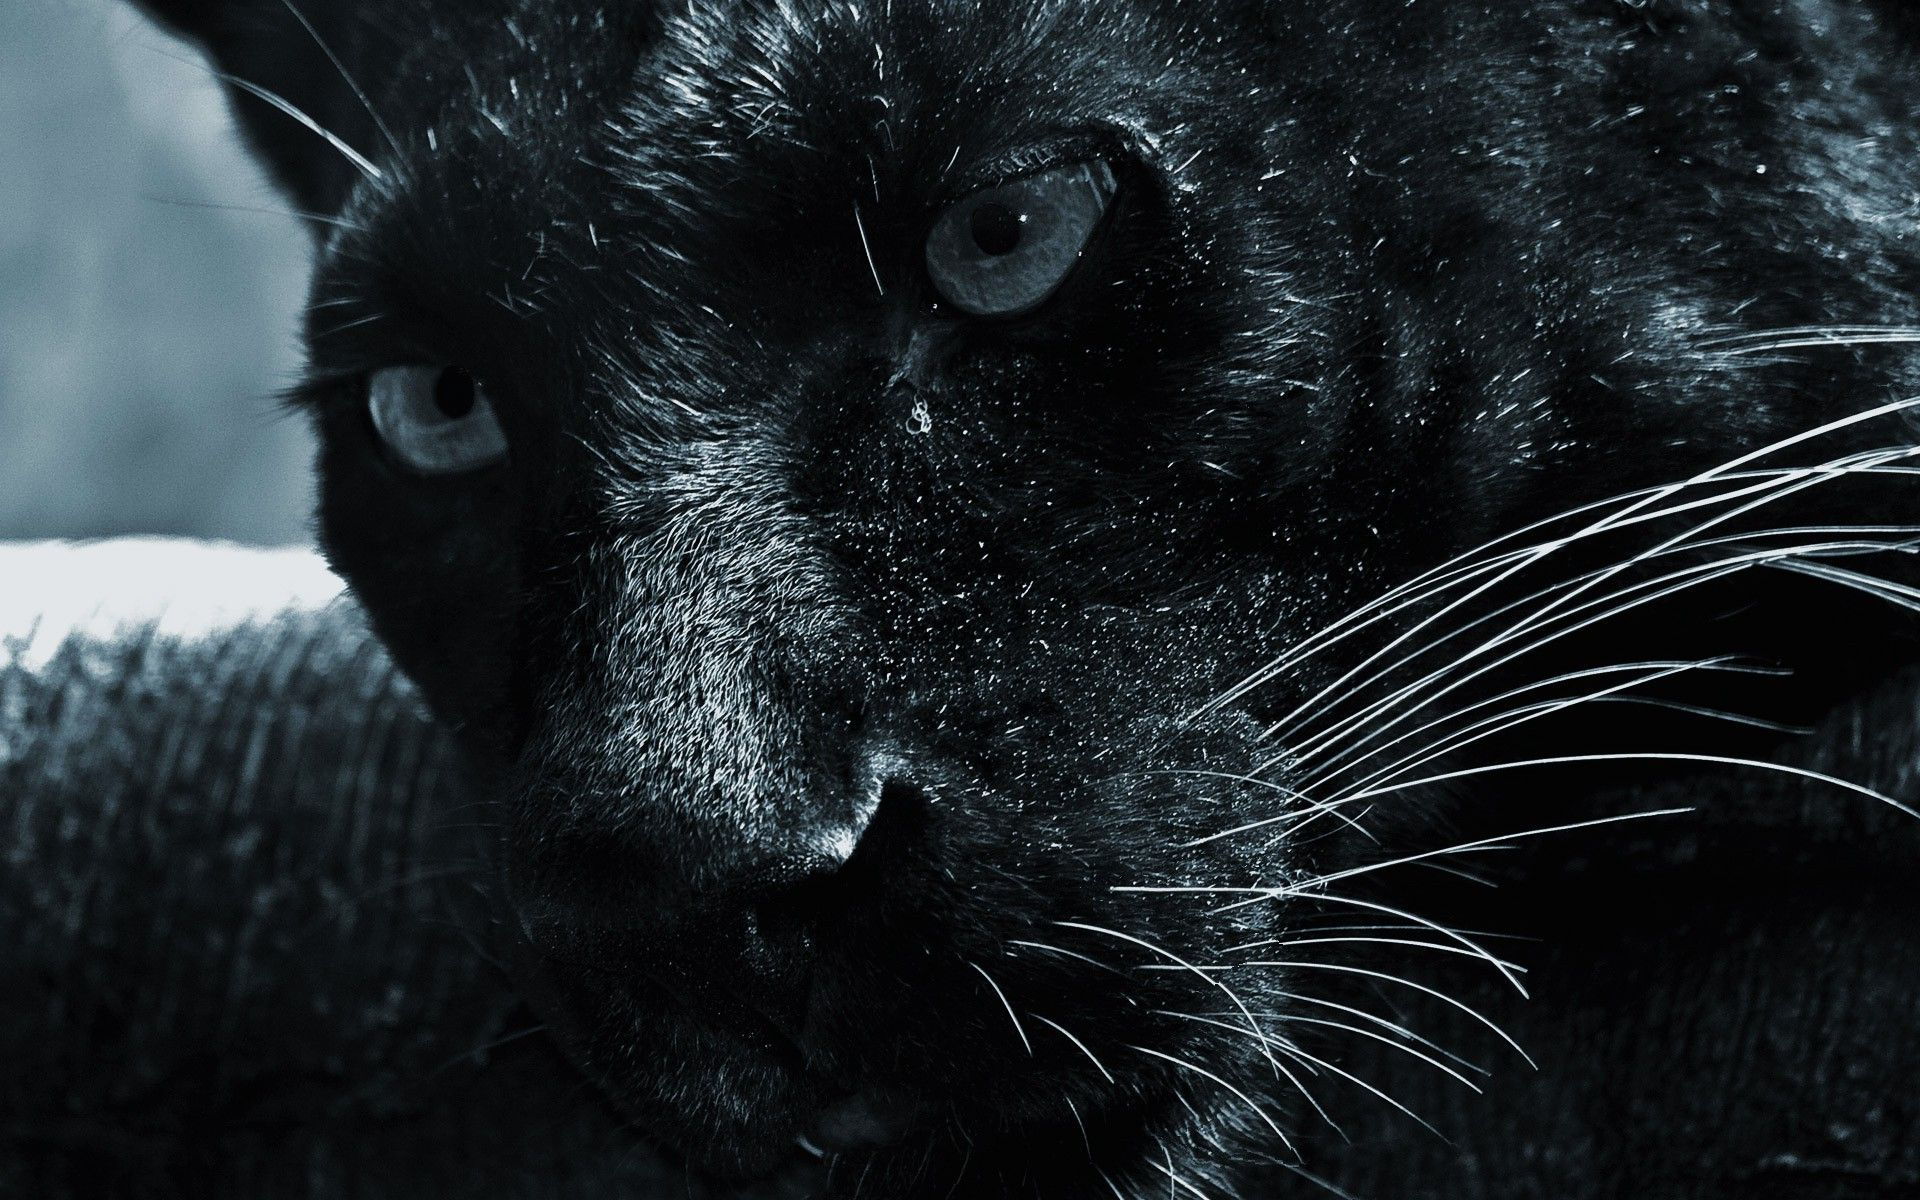 Black Jaguar Wallpapers Hd Download 1920x1200